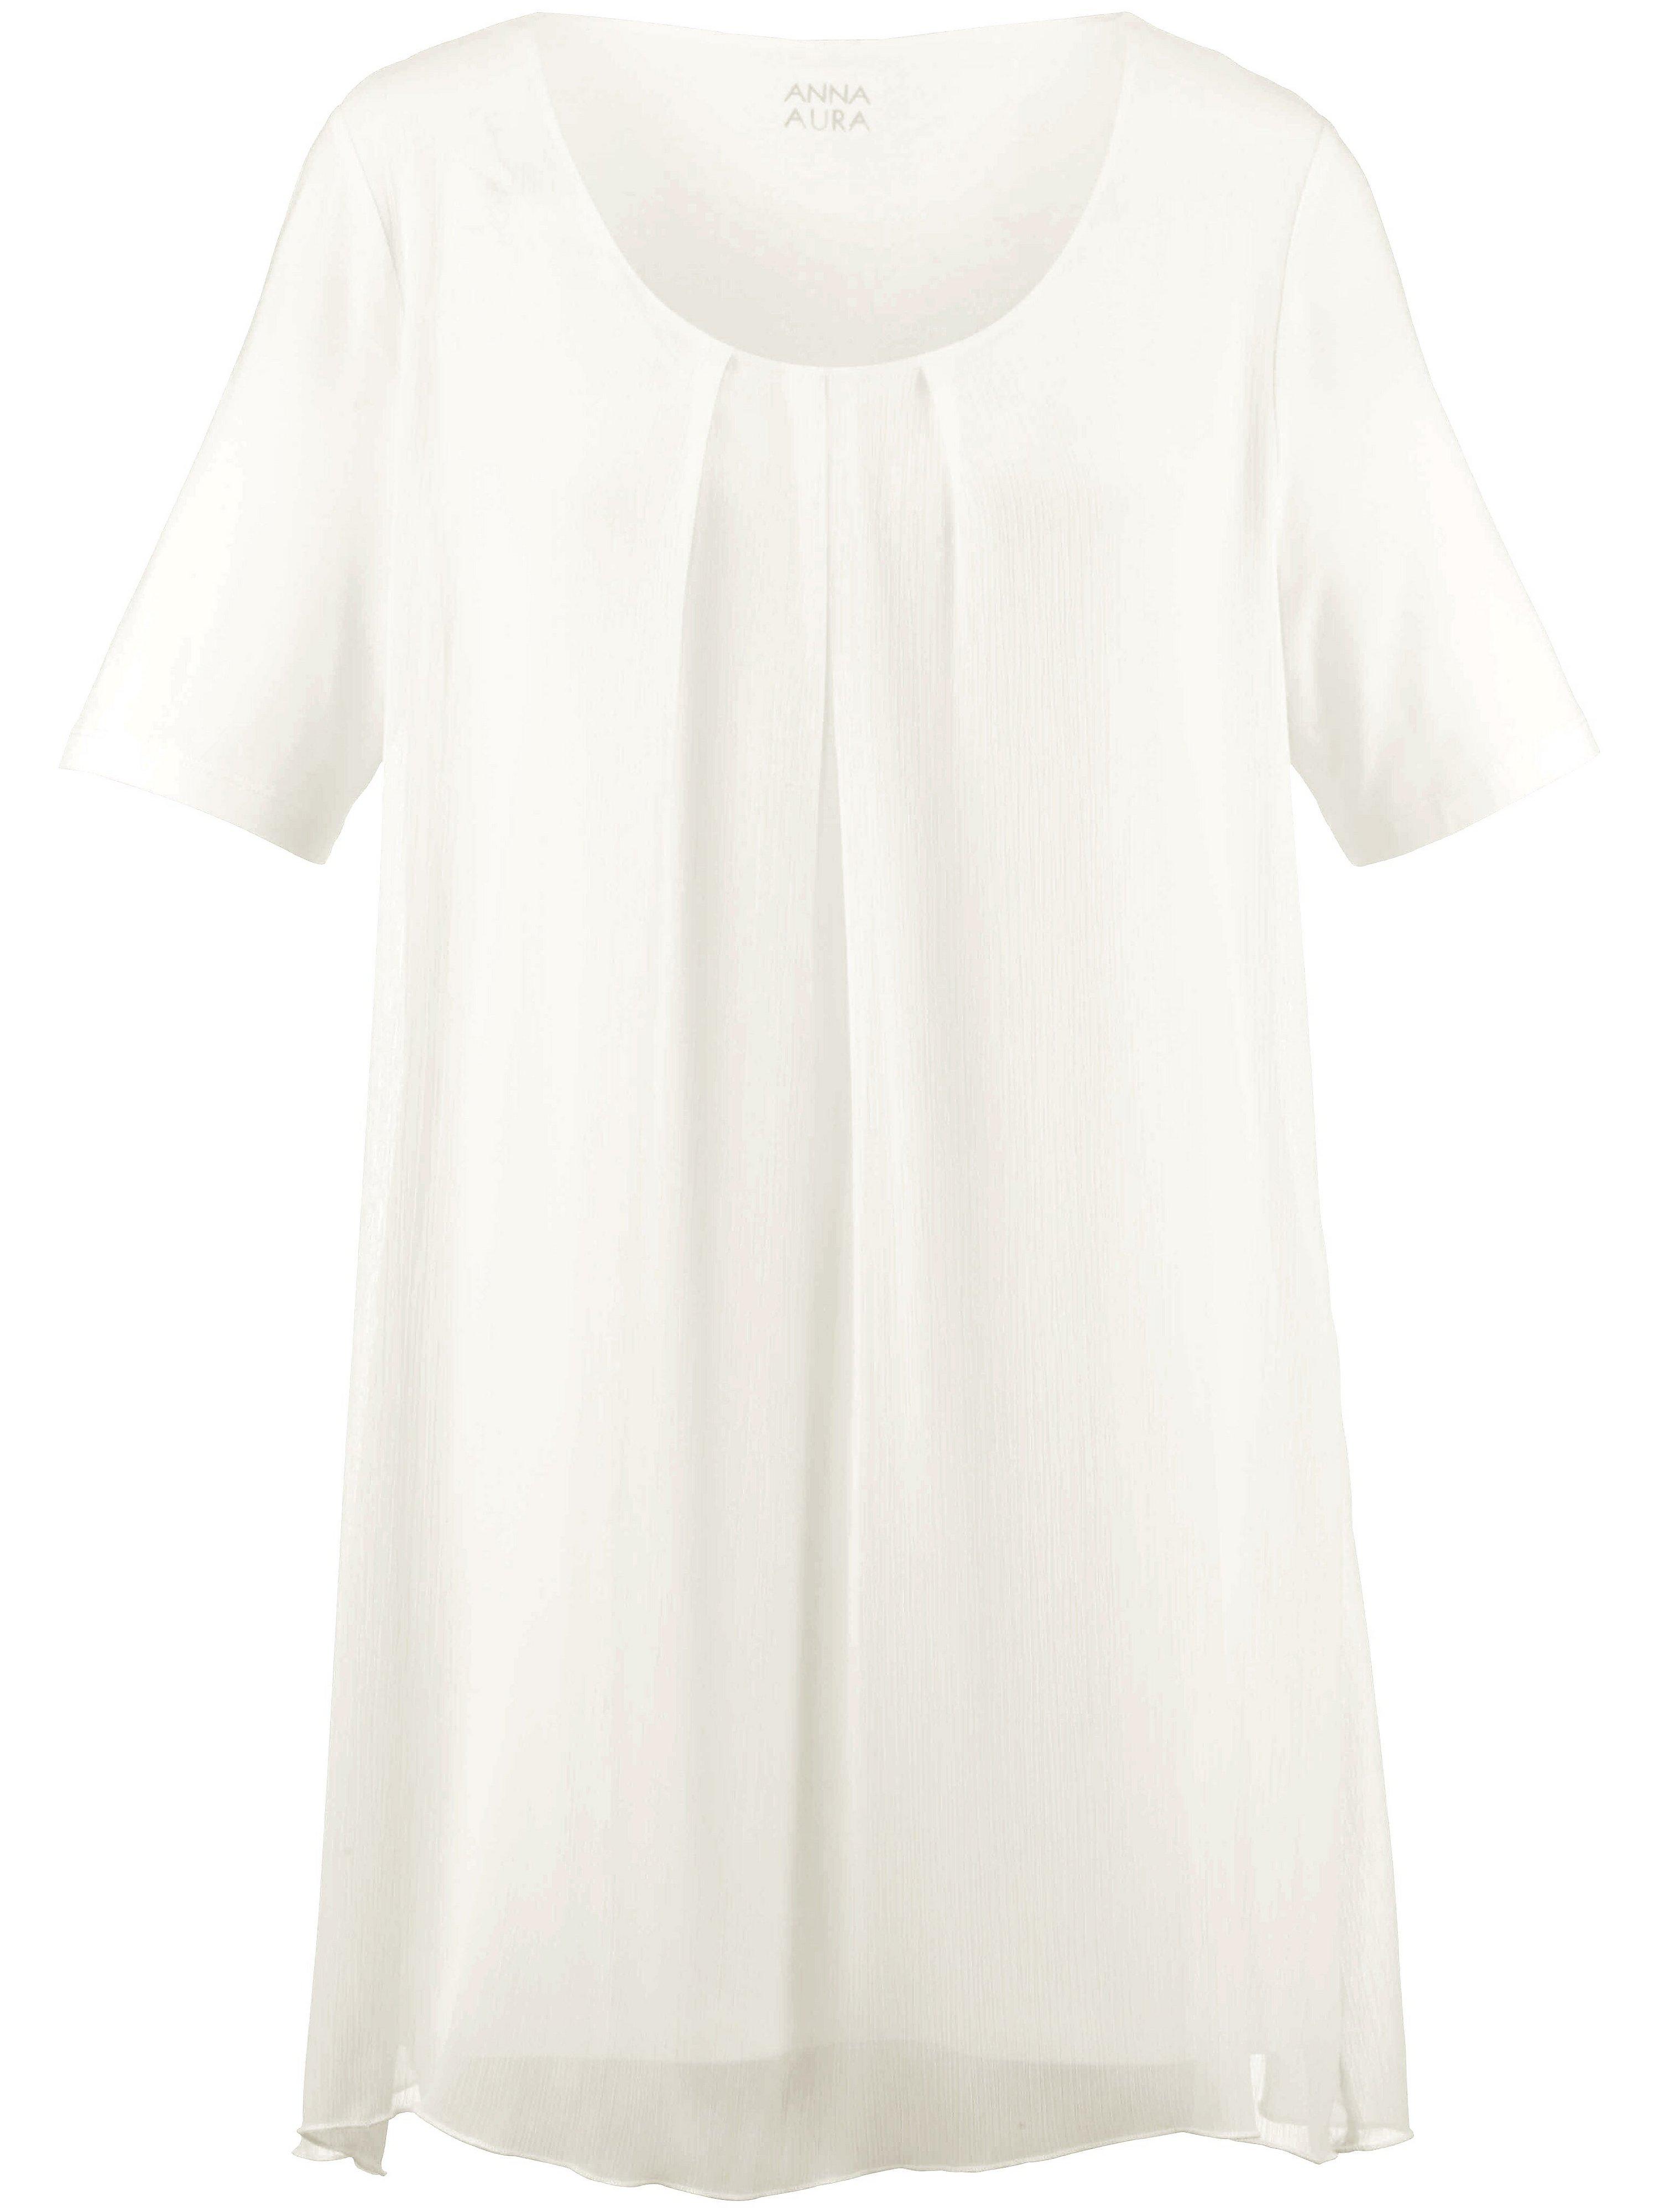 Shirtblouse Van Anna Aura wit